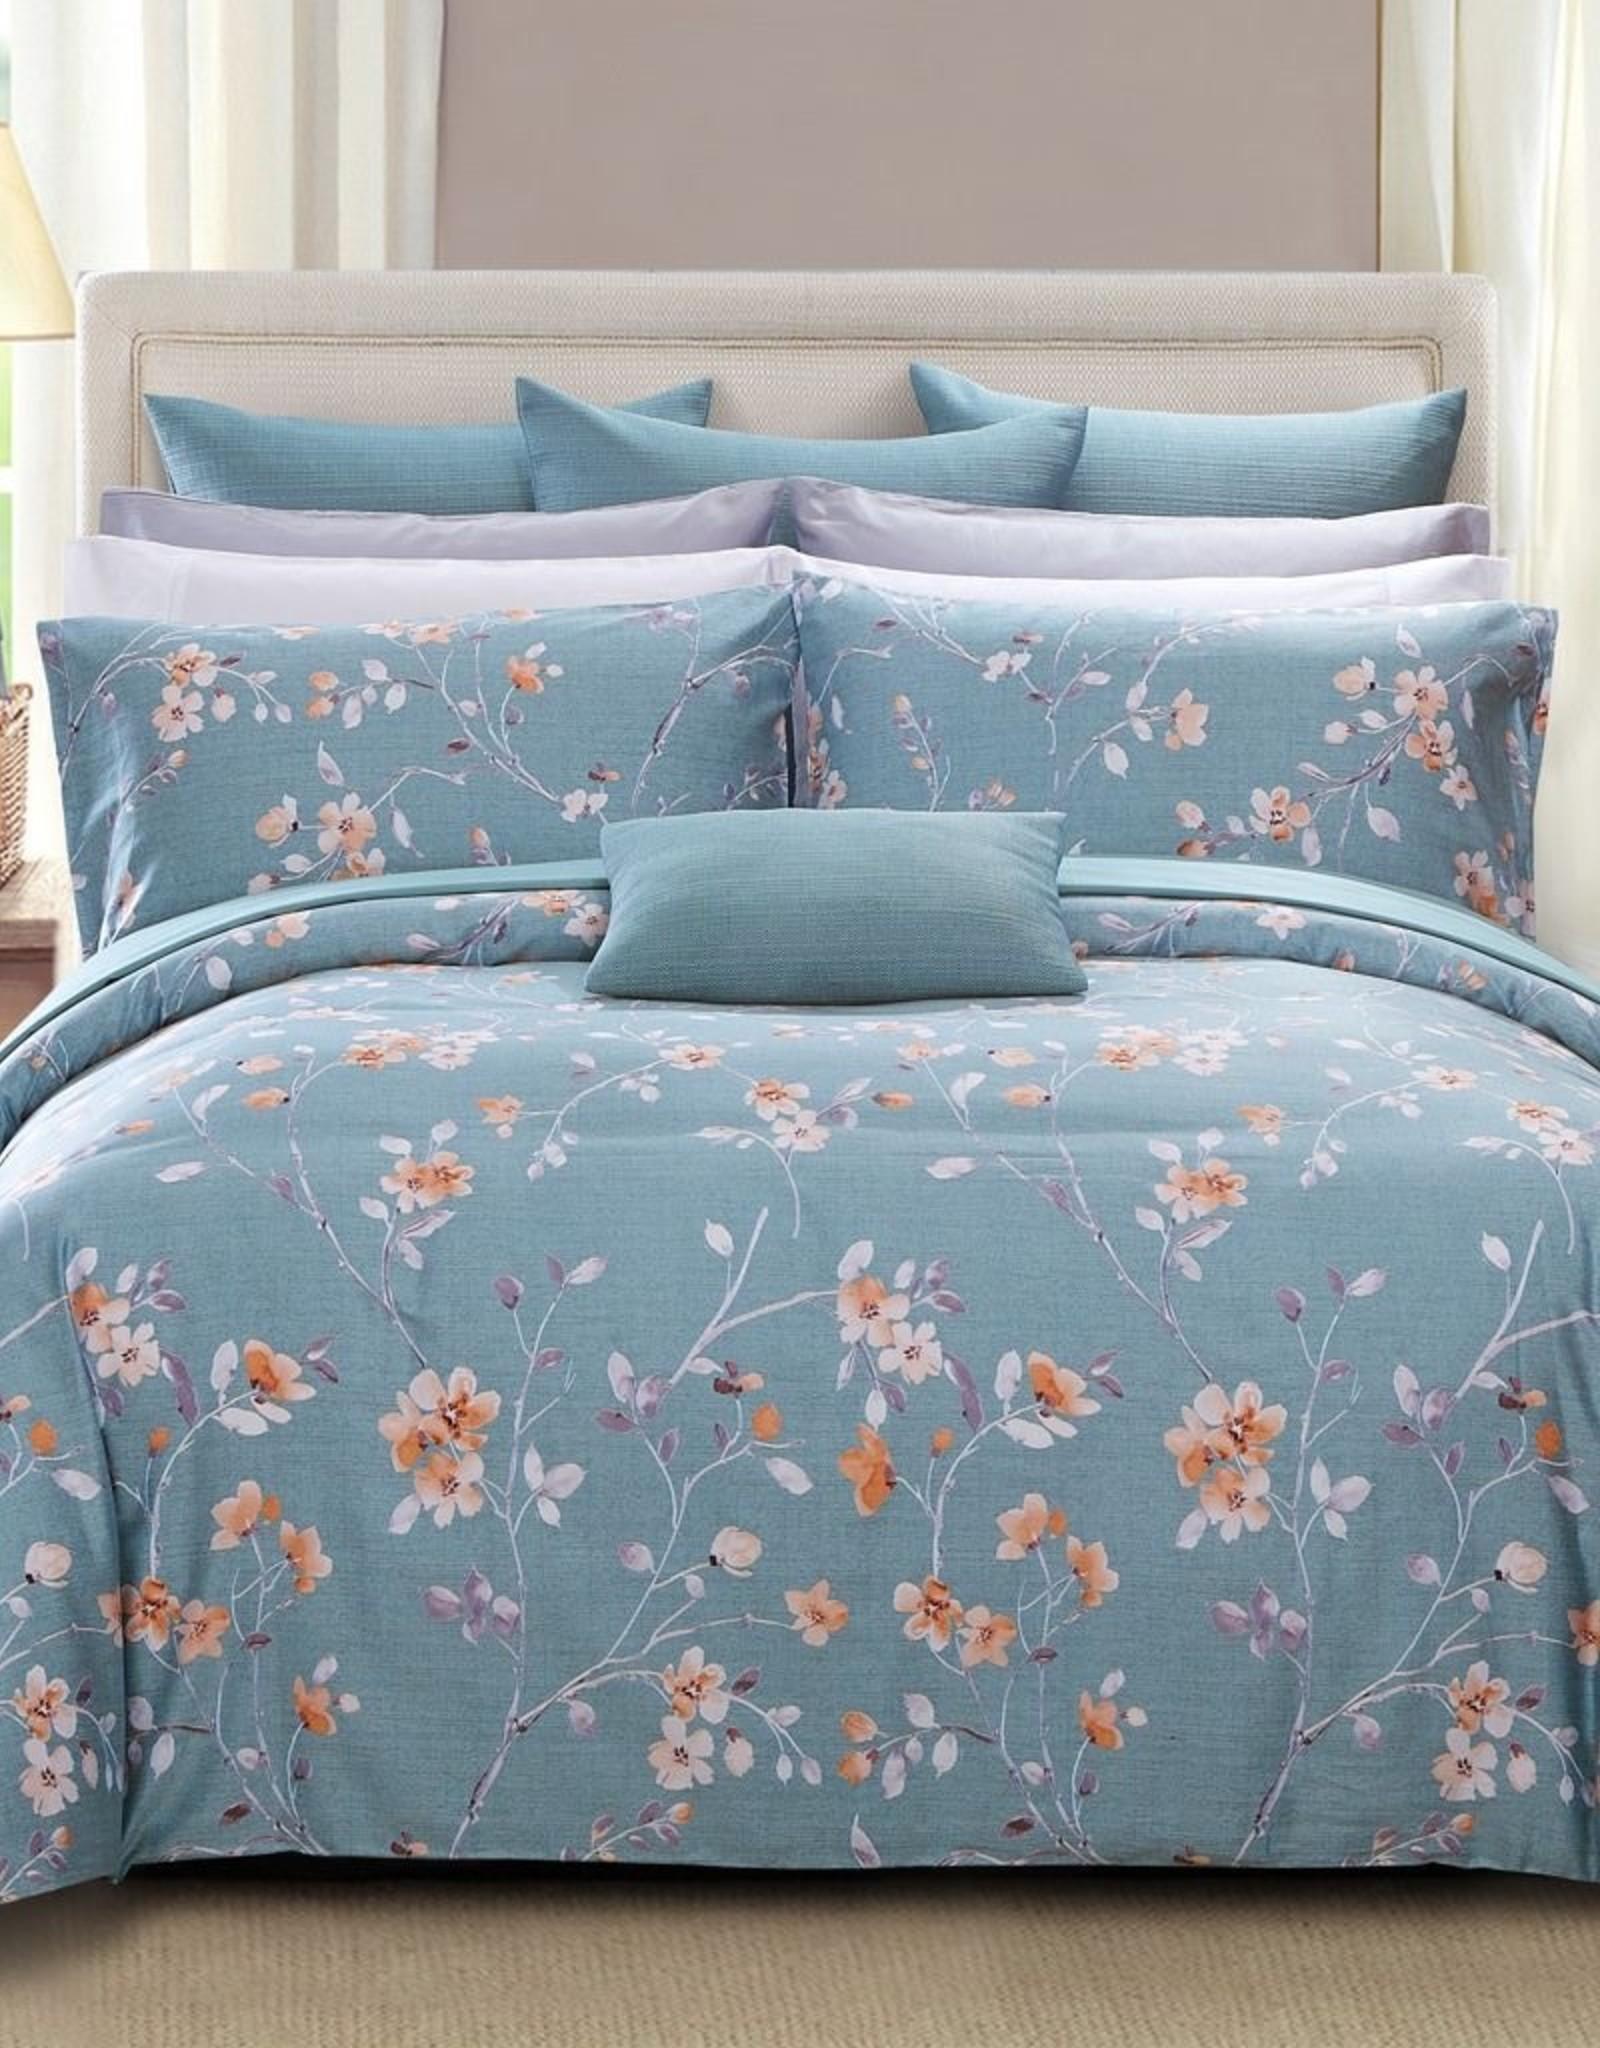 Daniadown Duvet Set Daniadown Sage Queen w / Pillow Cases**